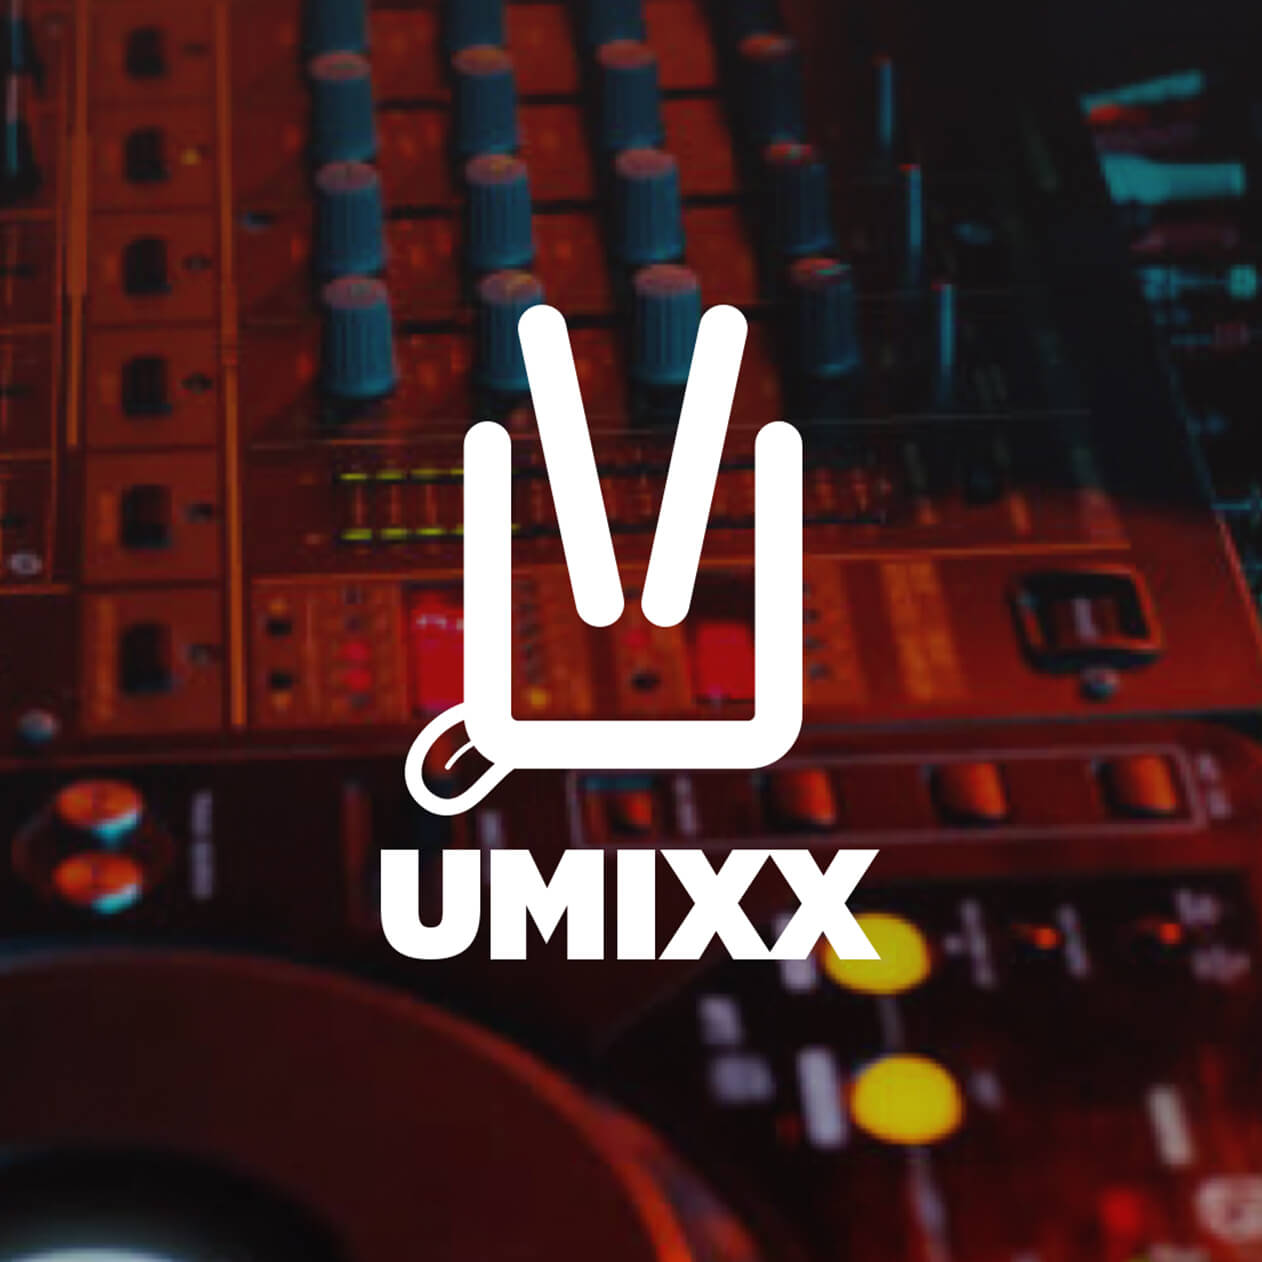 UMIXX